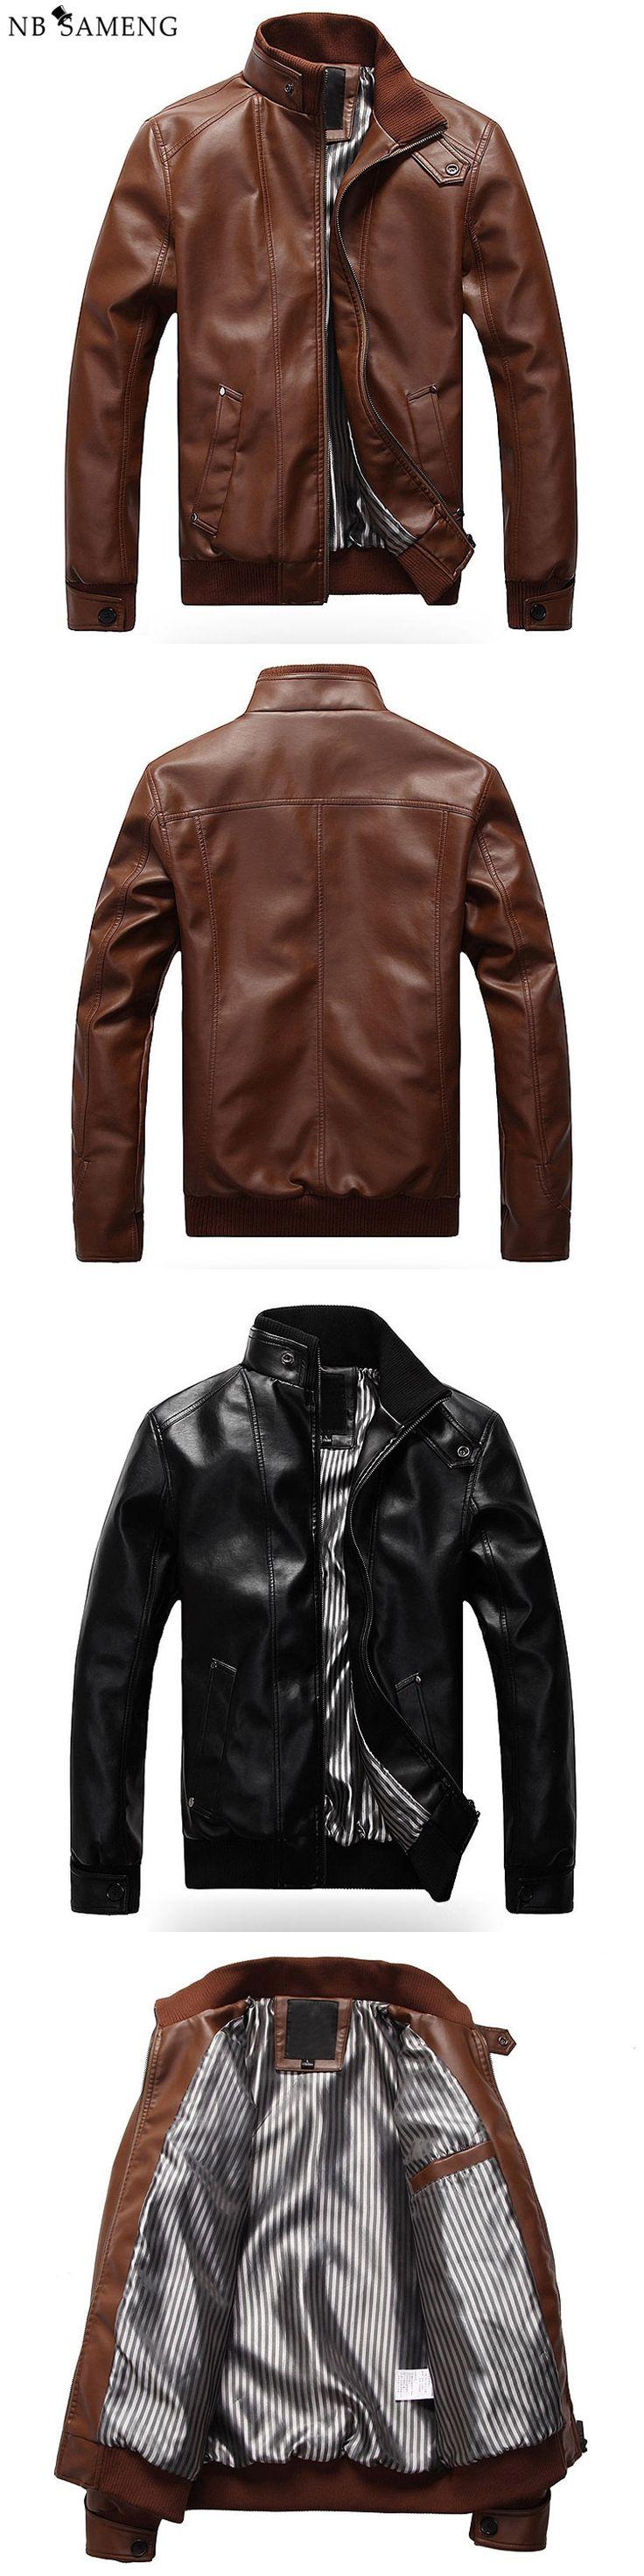 2017 New Fashion Male Leather Jacket Plus Size M-XXXL  Black Brown Mens Mandarin Collar PU Coats 13M0719